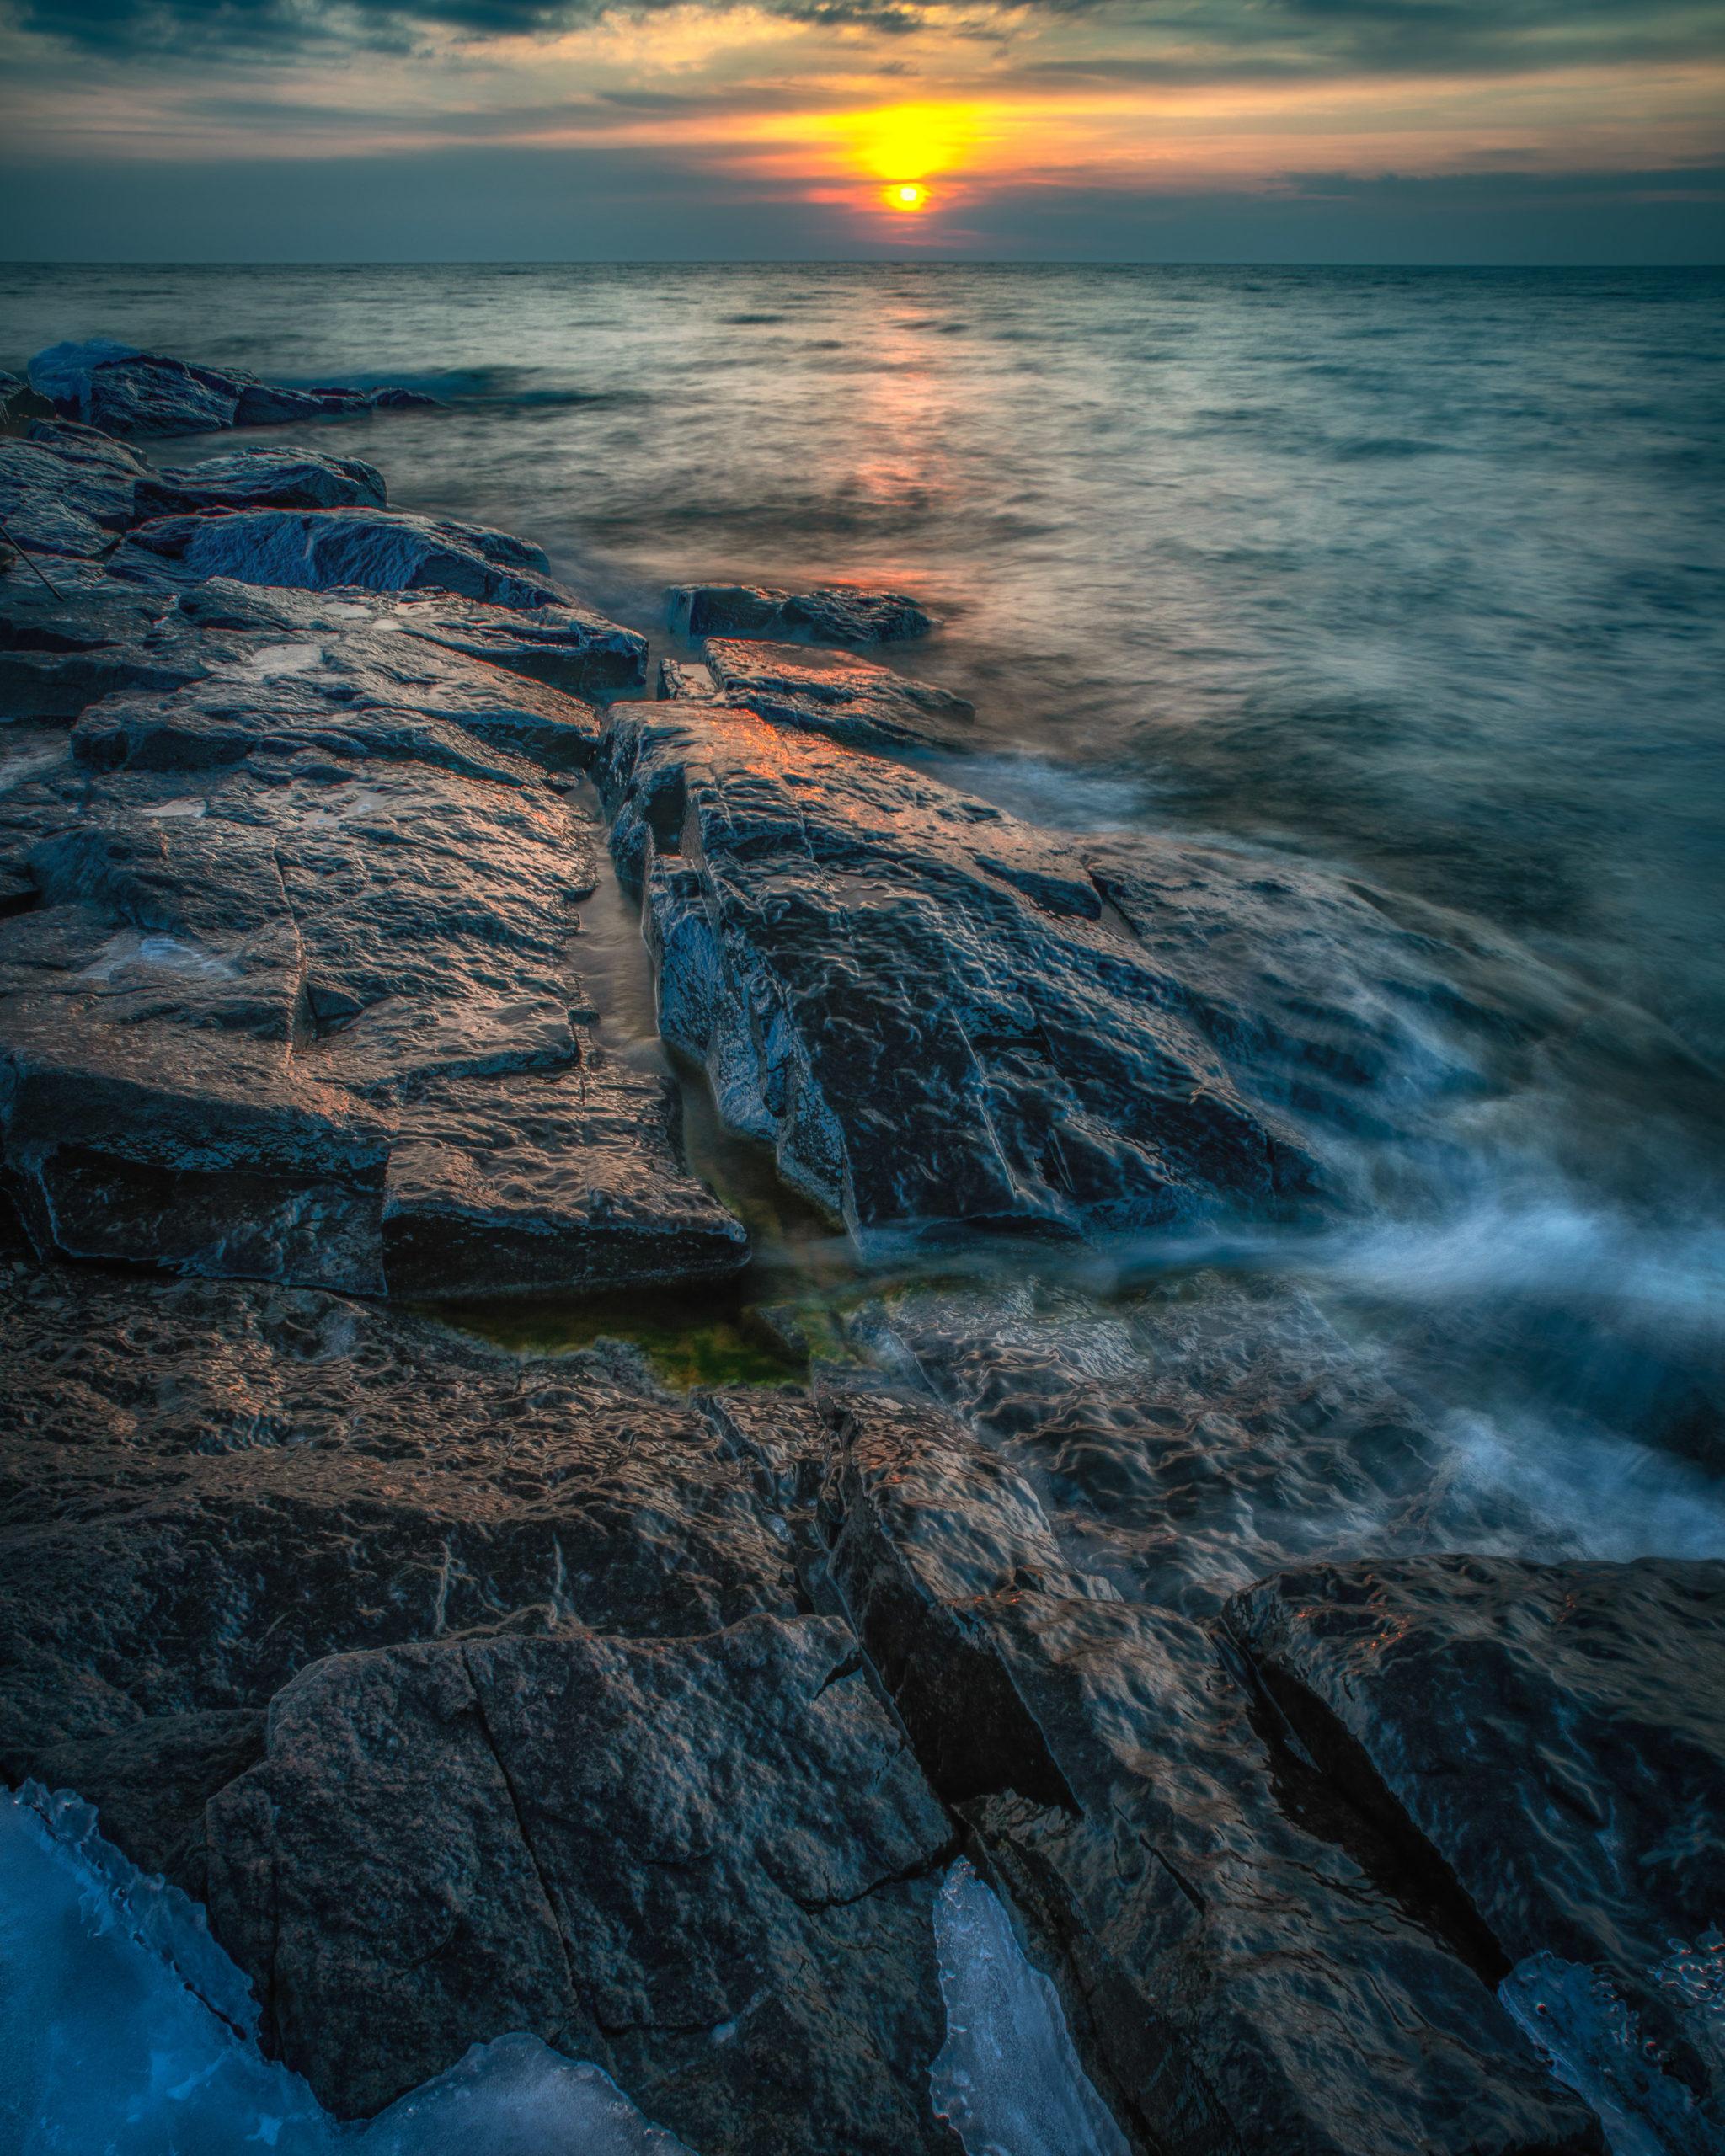 Sunrise at Cove Point